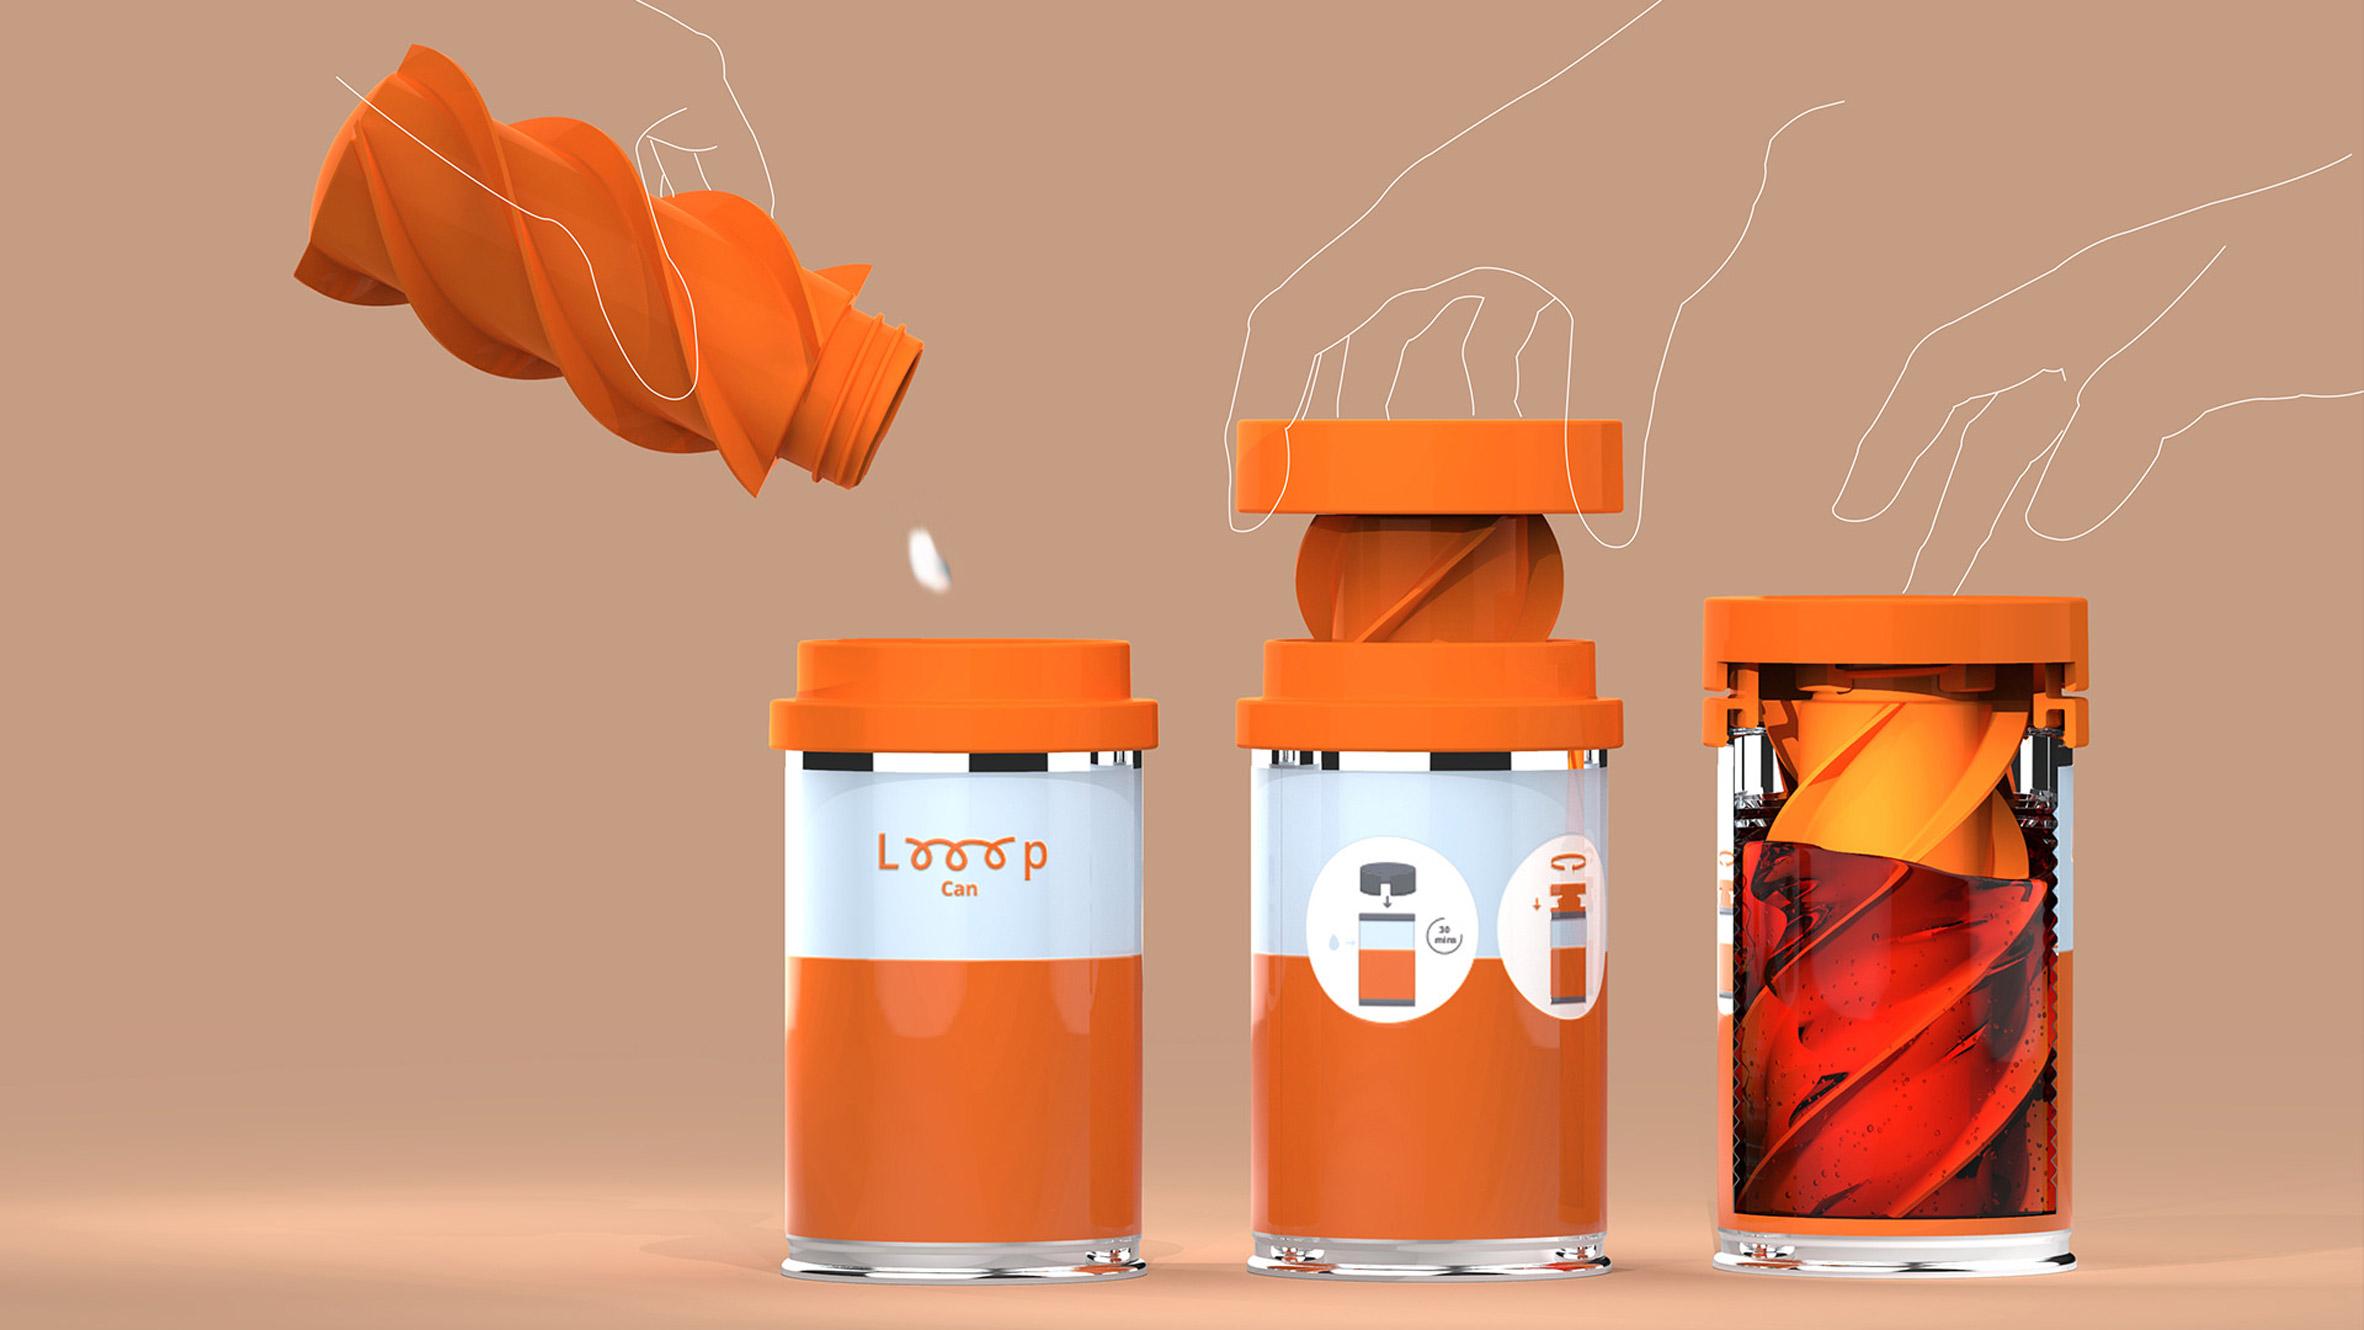 Three orange Looop cans washing sanitary pads